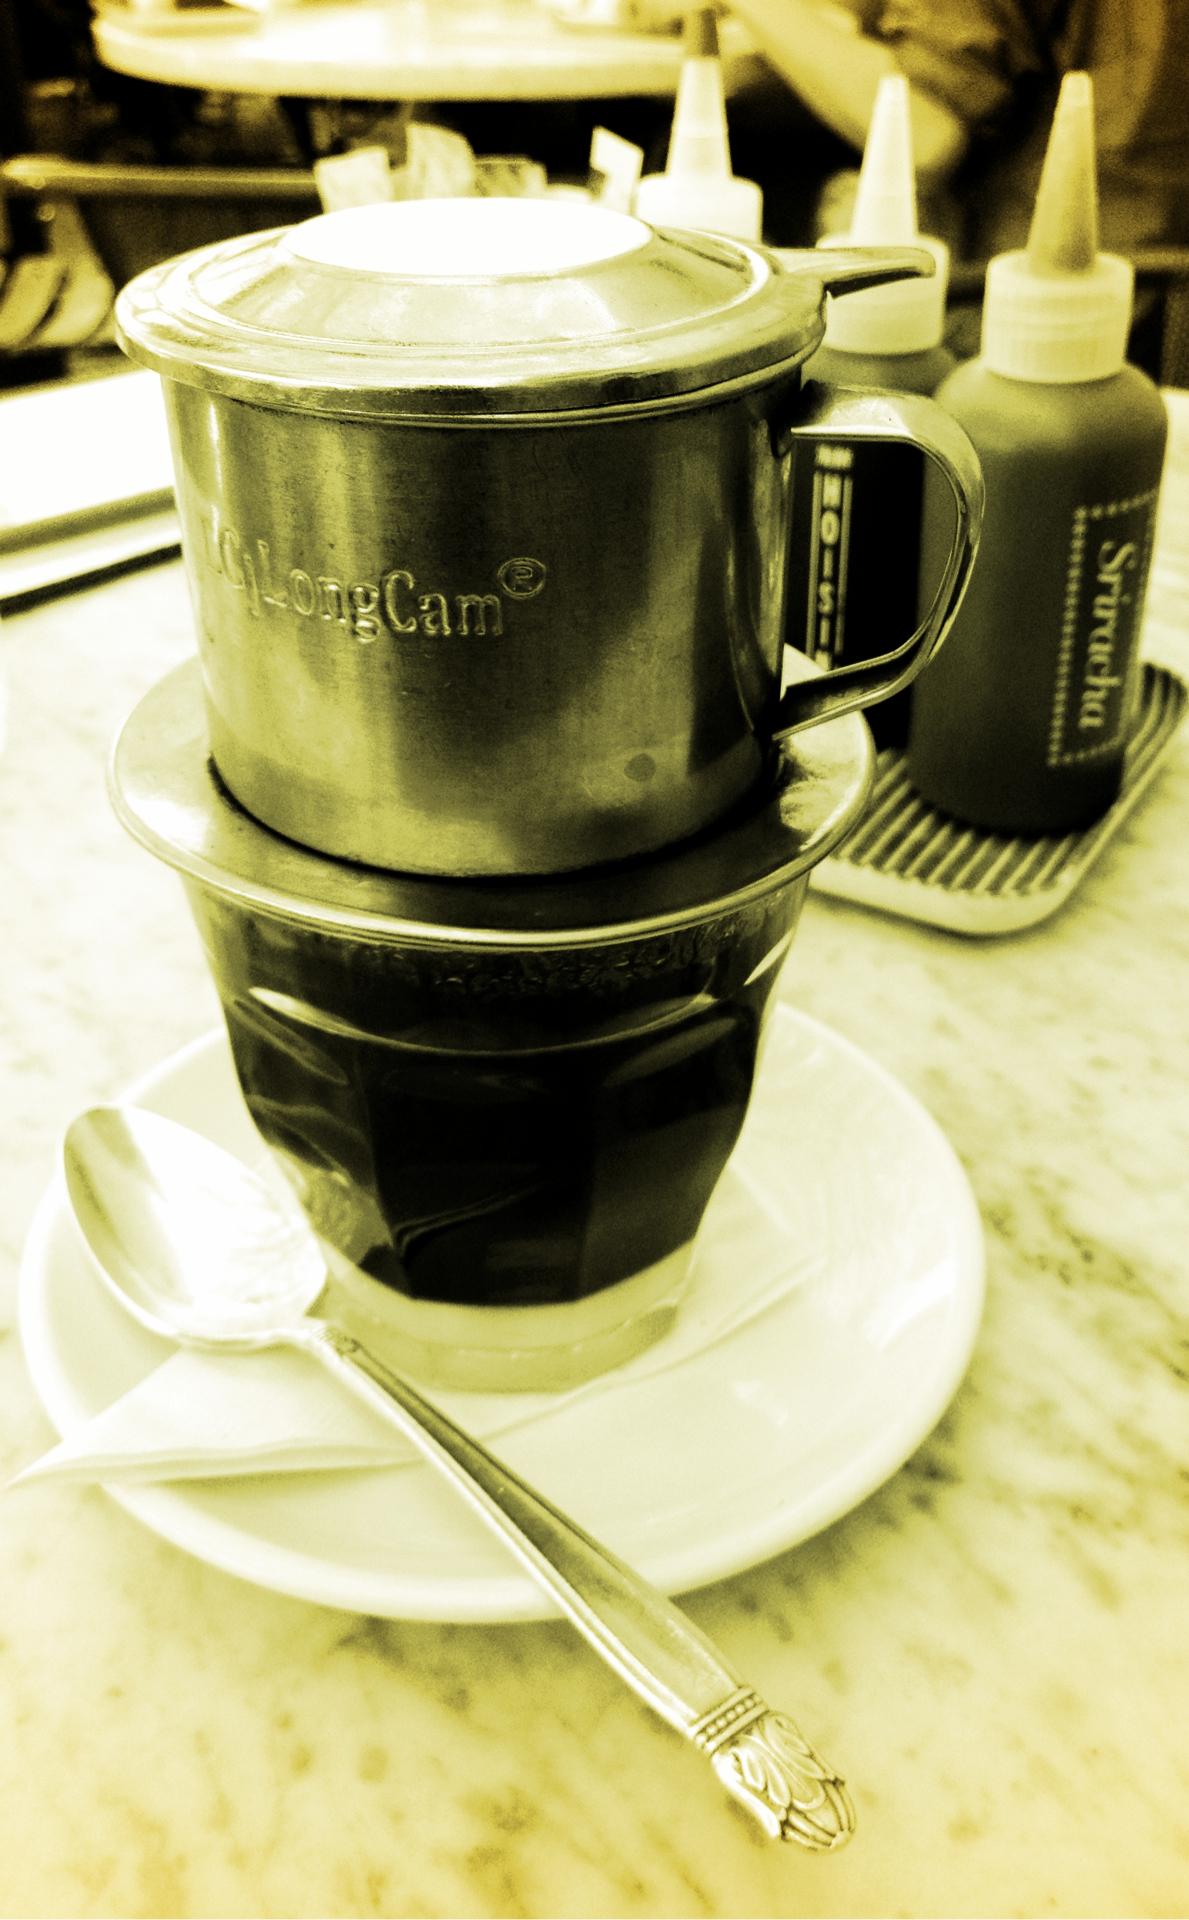 130311, daily caffeine fix, Vietnamese style.